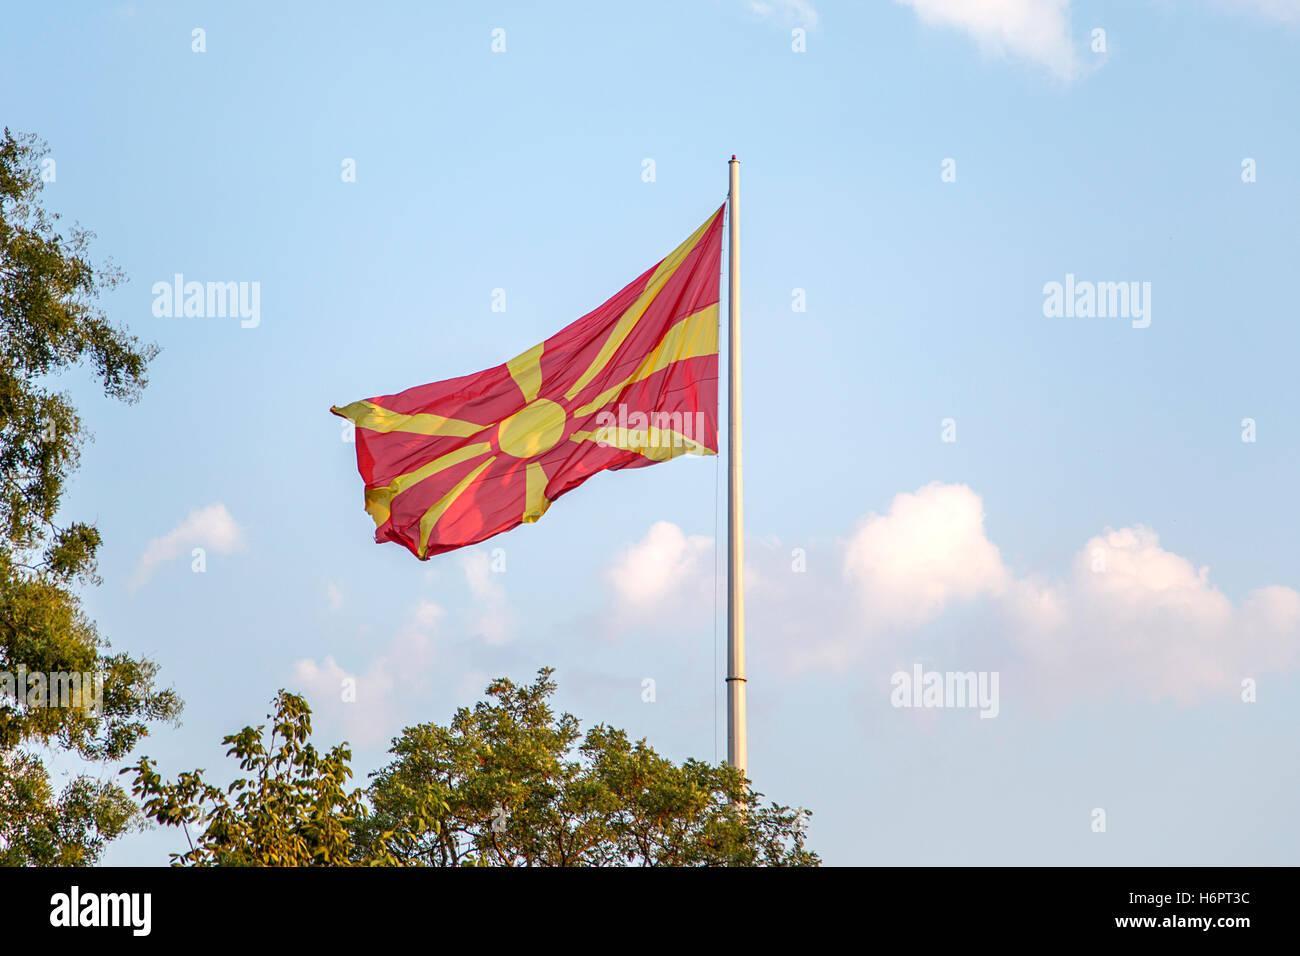 Macedonian flag wacing on a wind on a flagpole - Stock Image